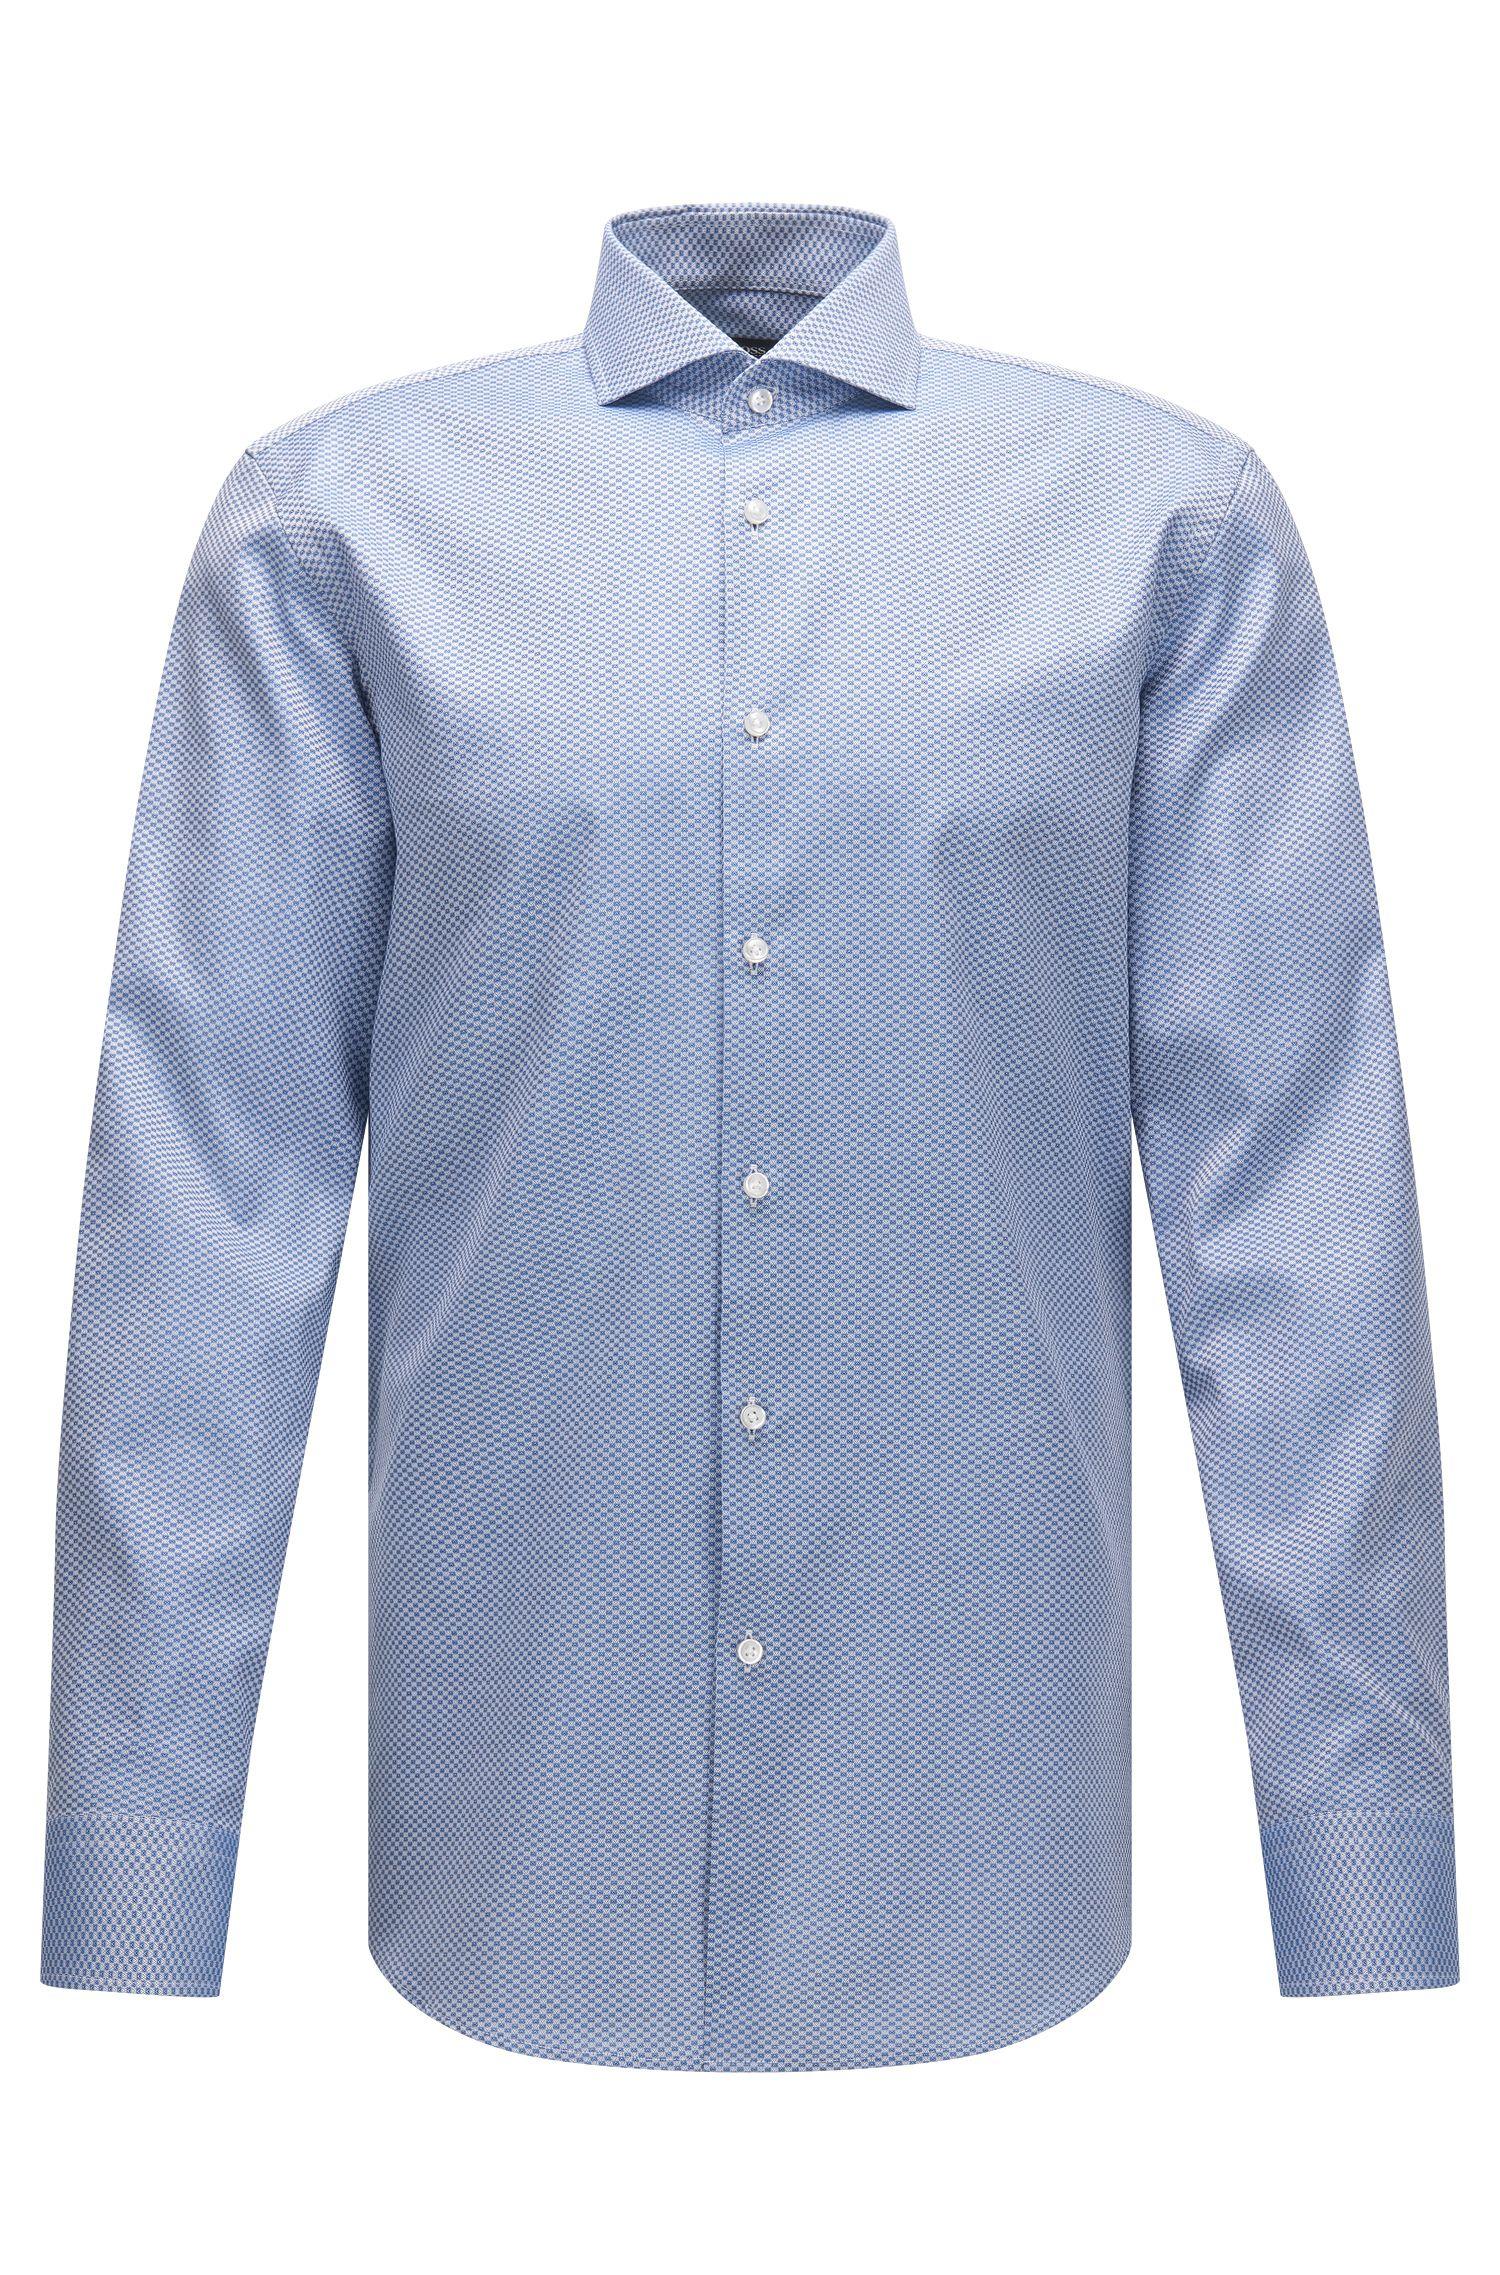 Checked Italian Cotton Dress Shirt, Slim Fit | Jason